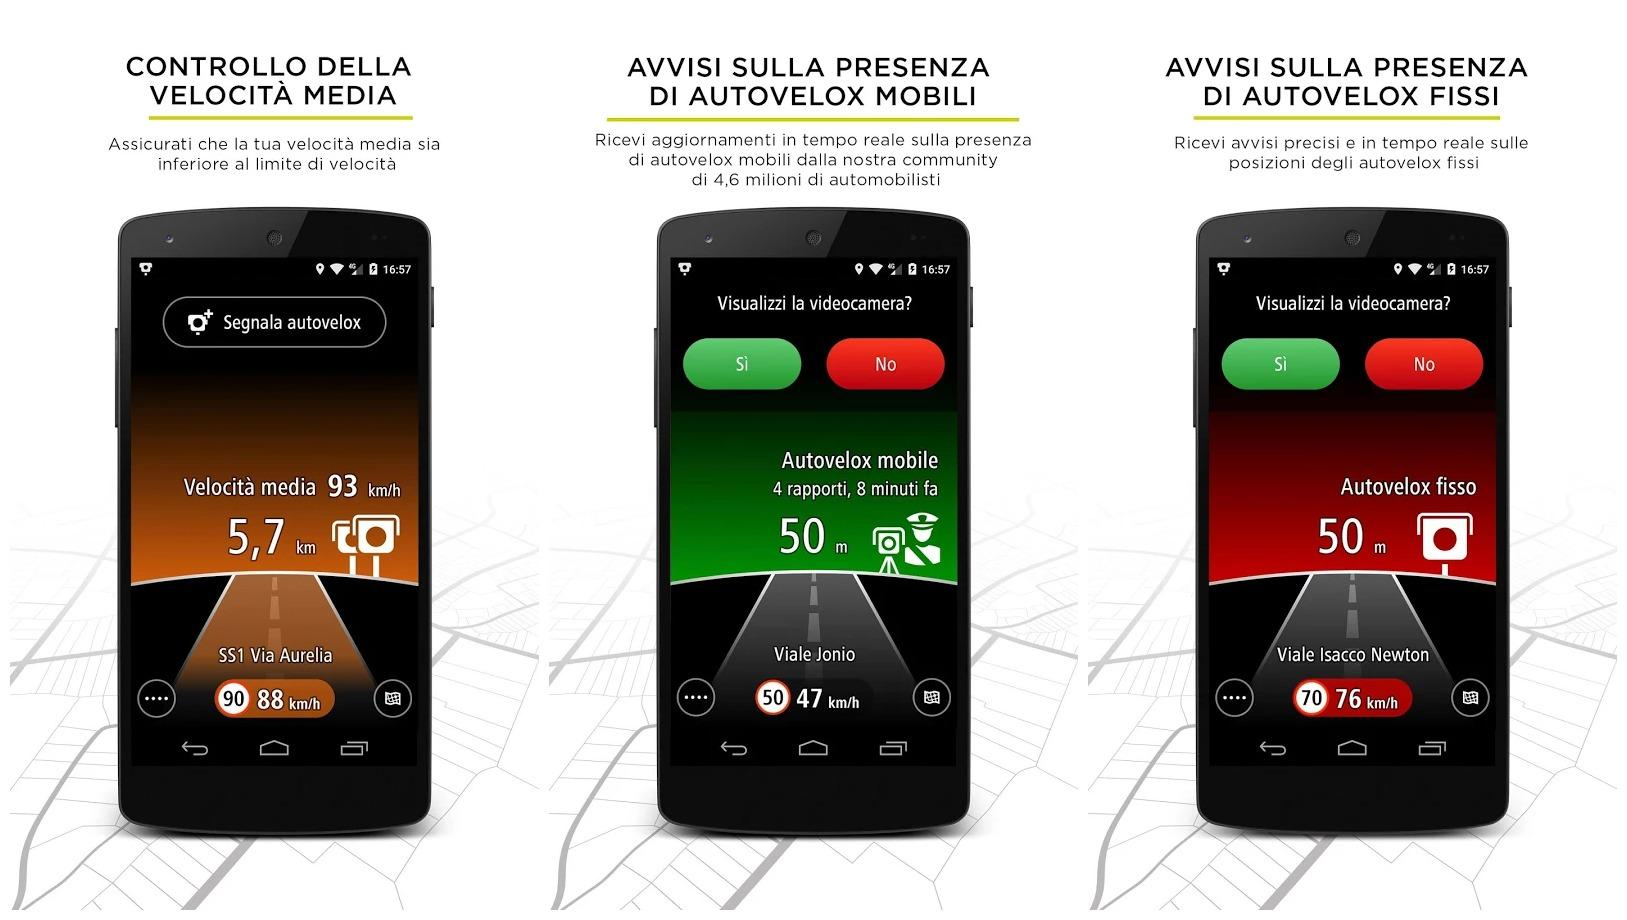 installare autovelox su tomtom android - sippartnewphre ga